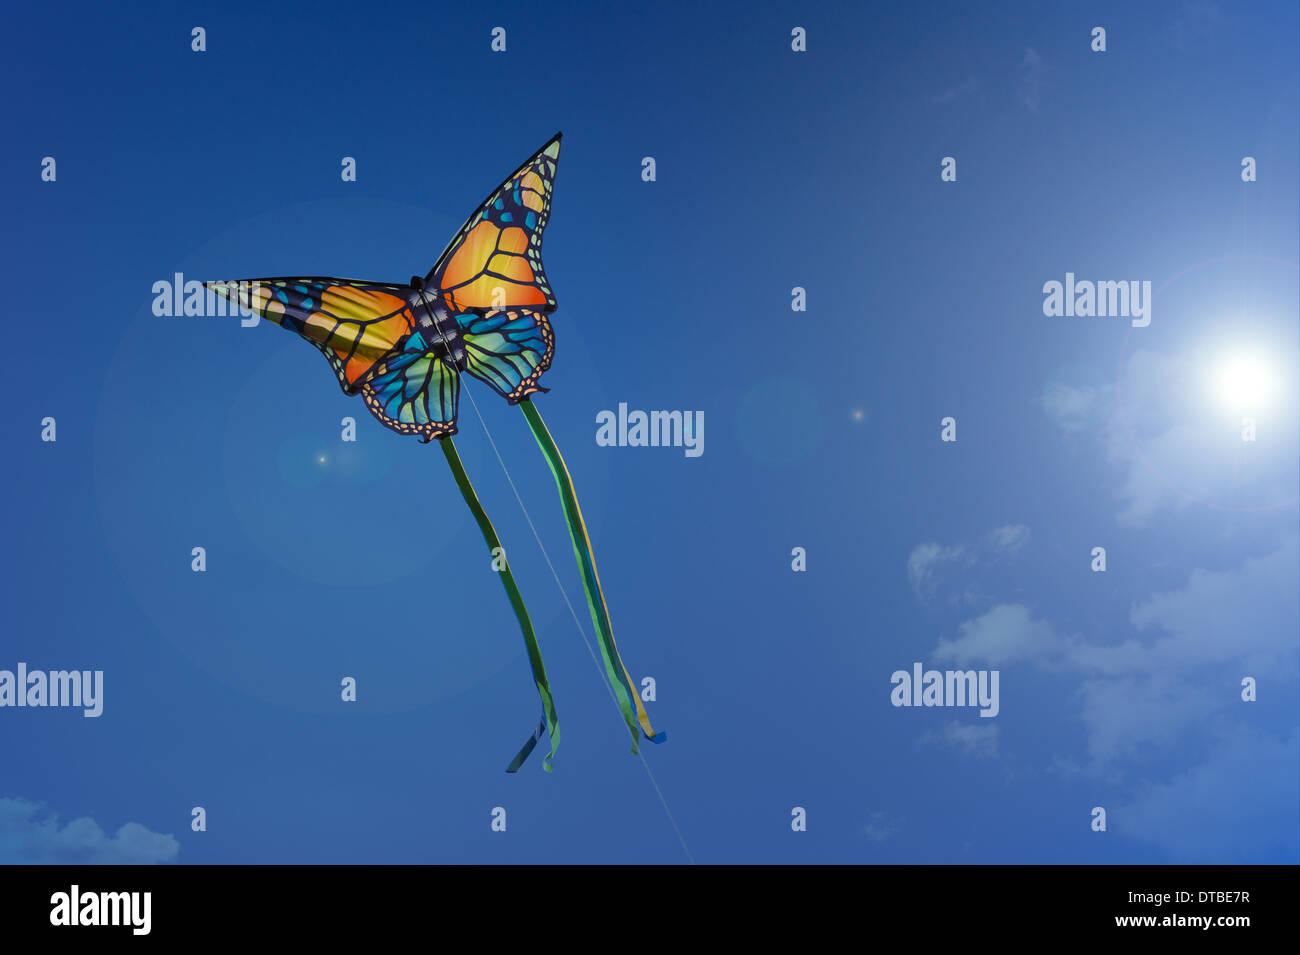 Berlin, Germany , fly kites - Stock Image